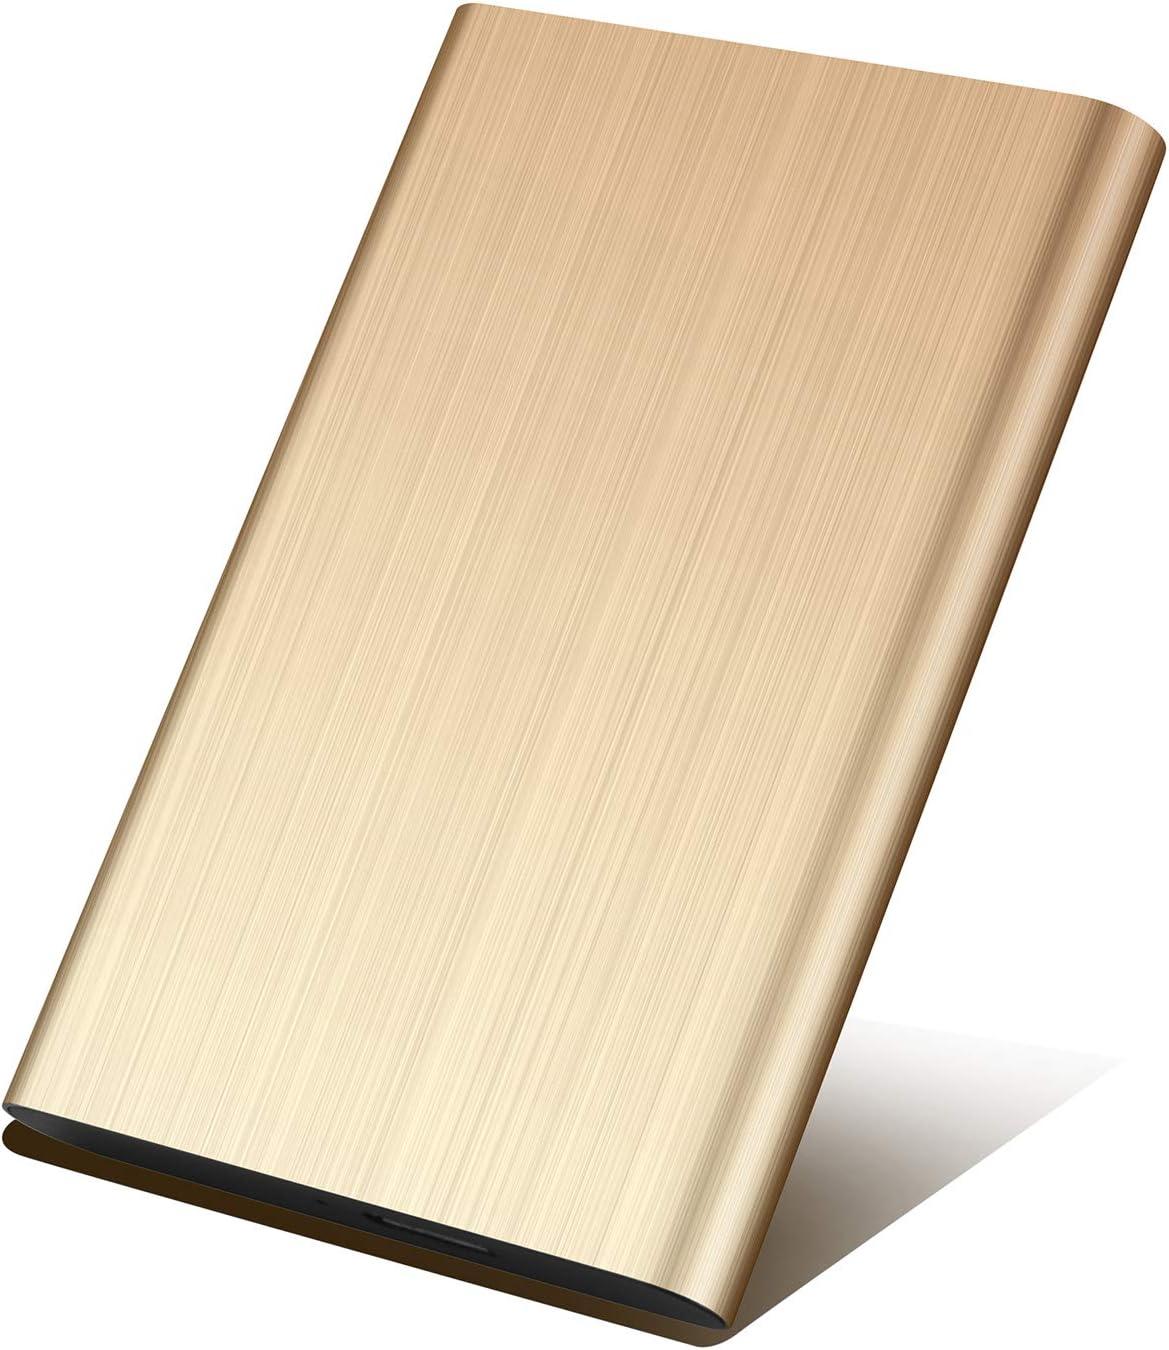 1 TB, Negro USB3.0 SATA HDD Almacenamiento para PC y Mac Prode Disco Duro Externo Port/átil 2.5 1TB